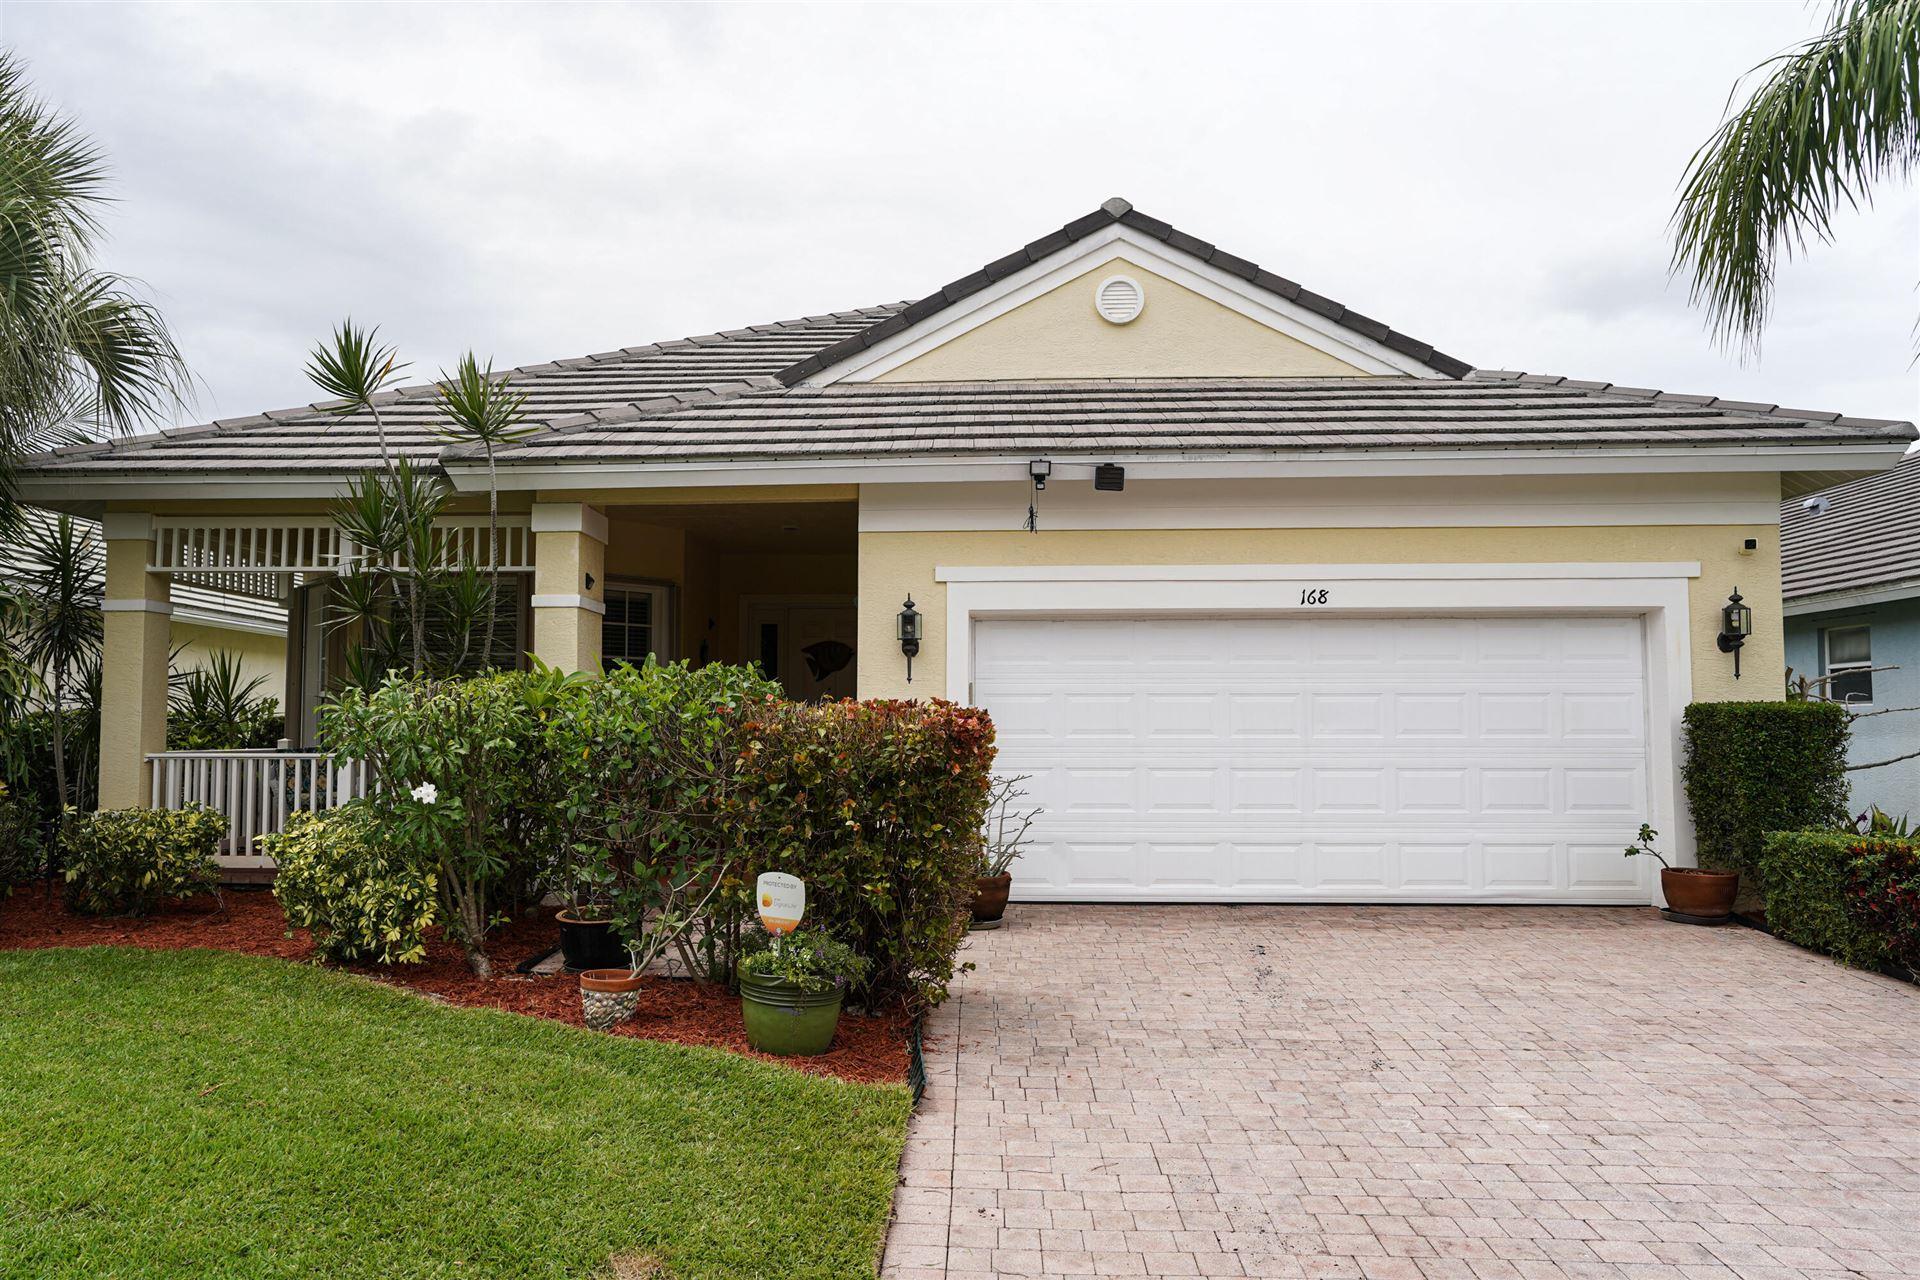 168 NW Willow Grove Avenue, Port Saint Lucie, FL 34986 - #: RX-10724937